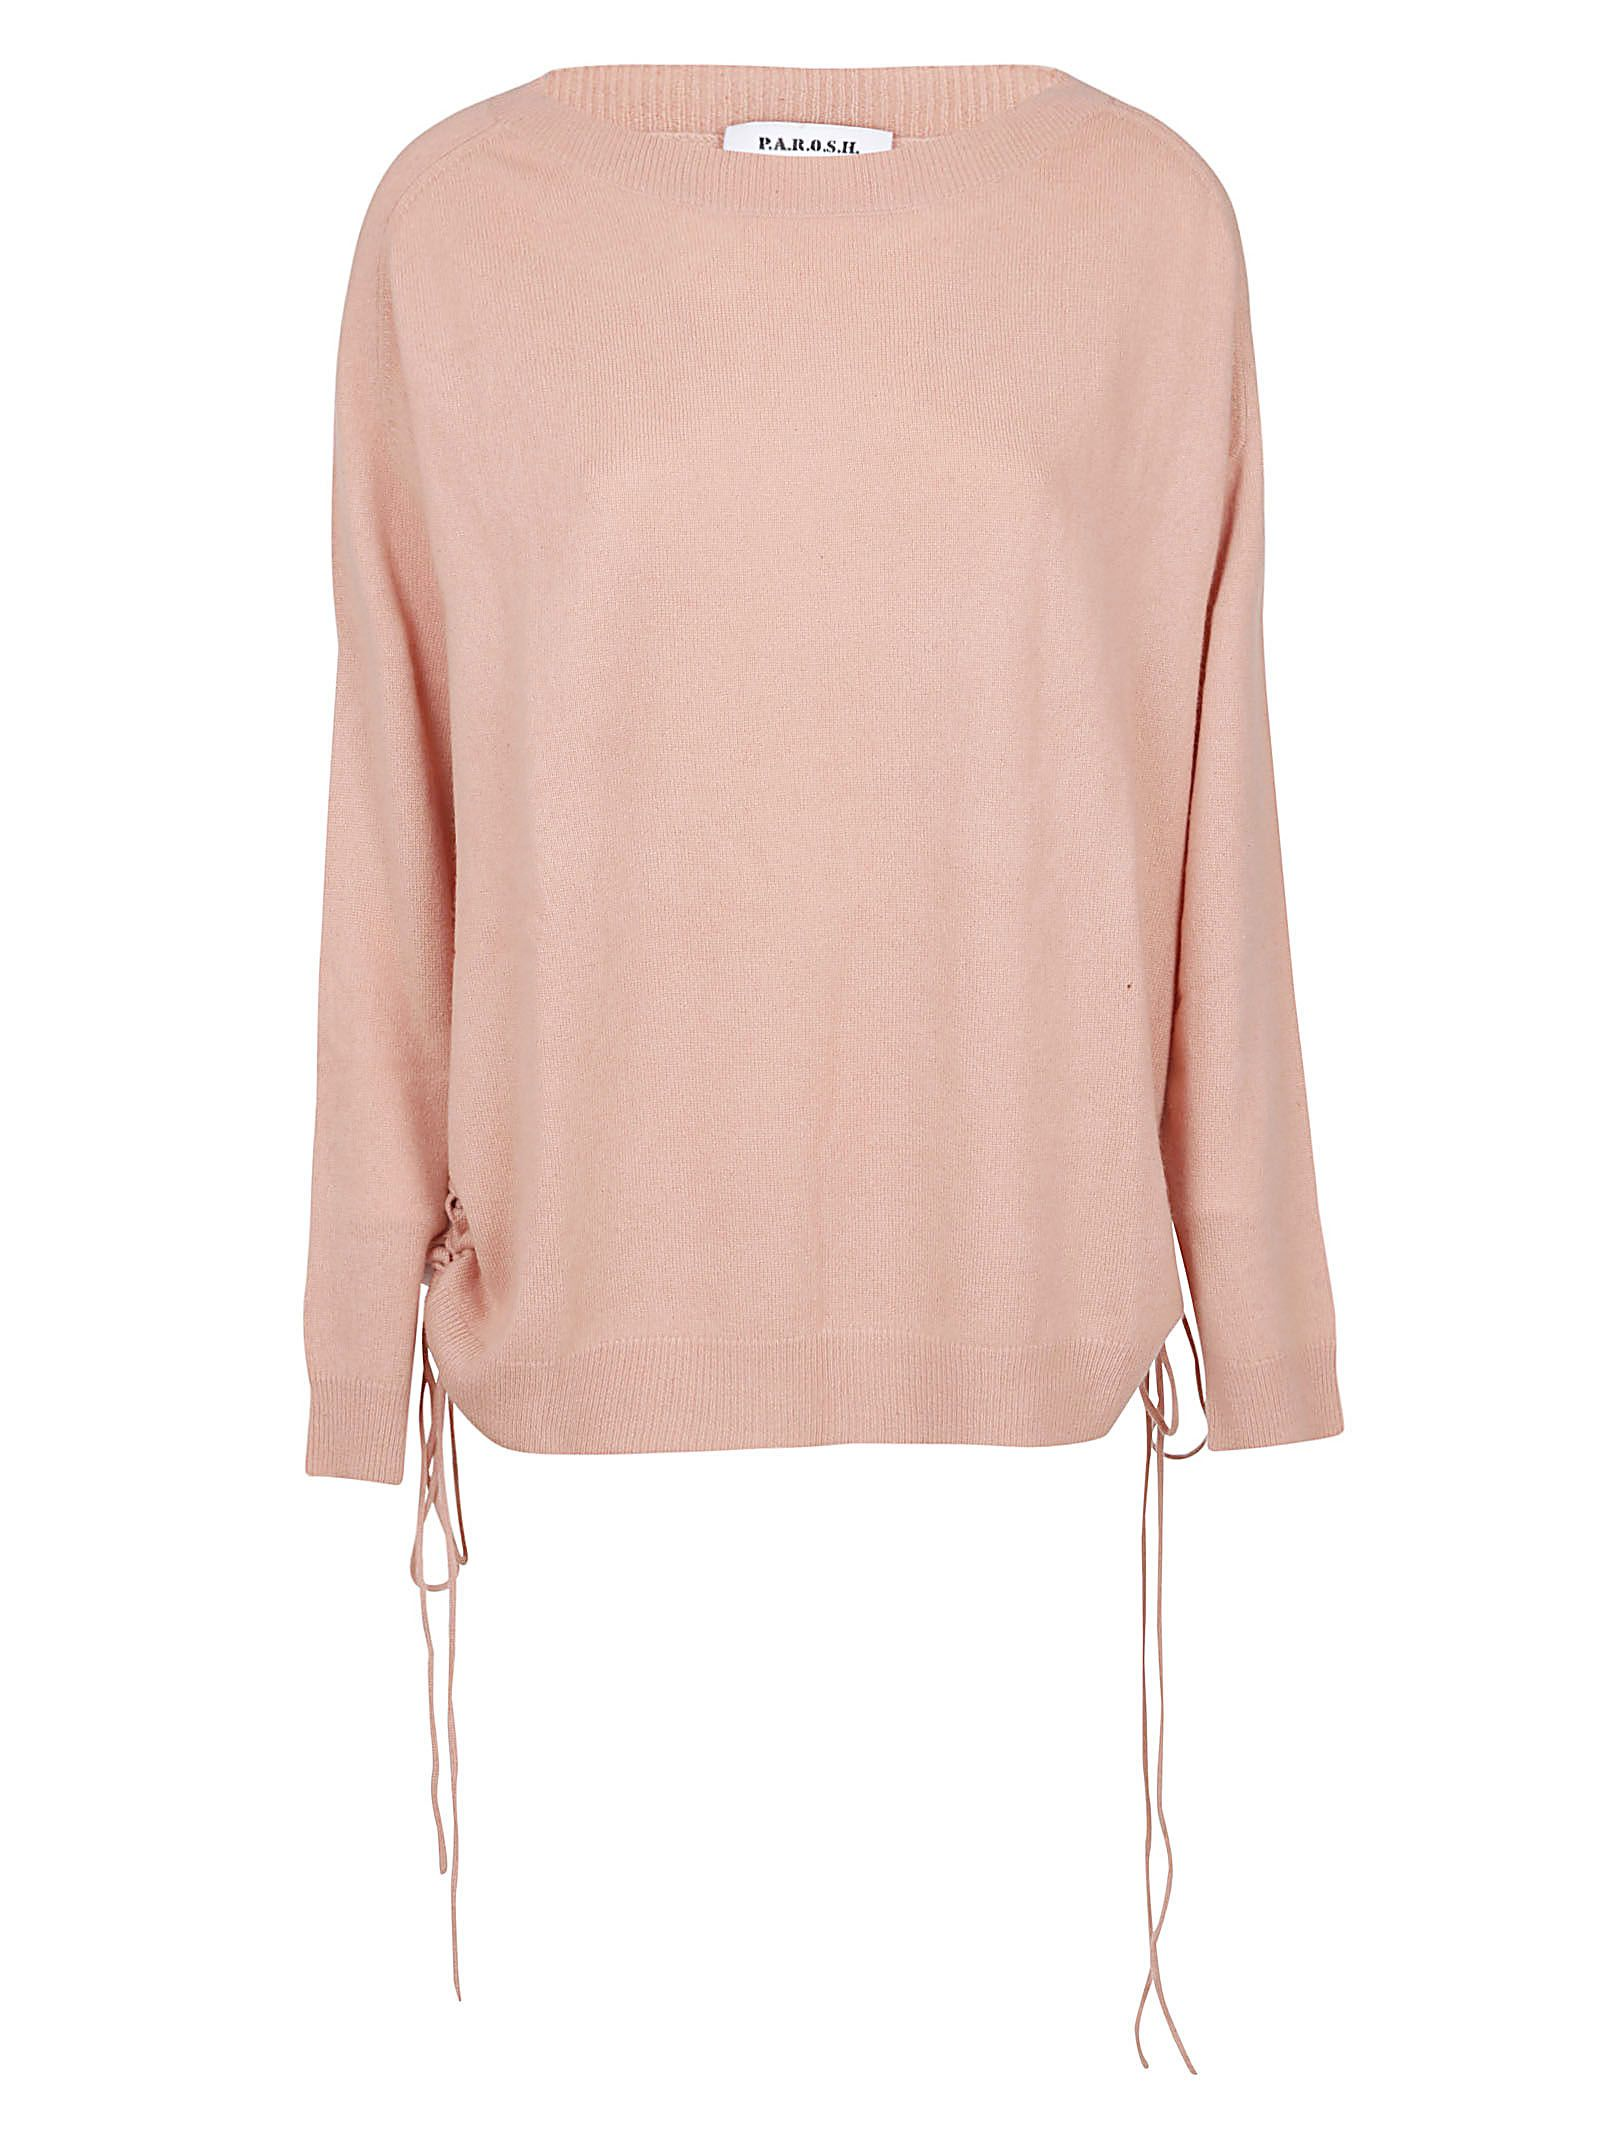 P.A.R.O.S.H. | Parosh Drawstring Sweater | Clouty